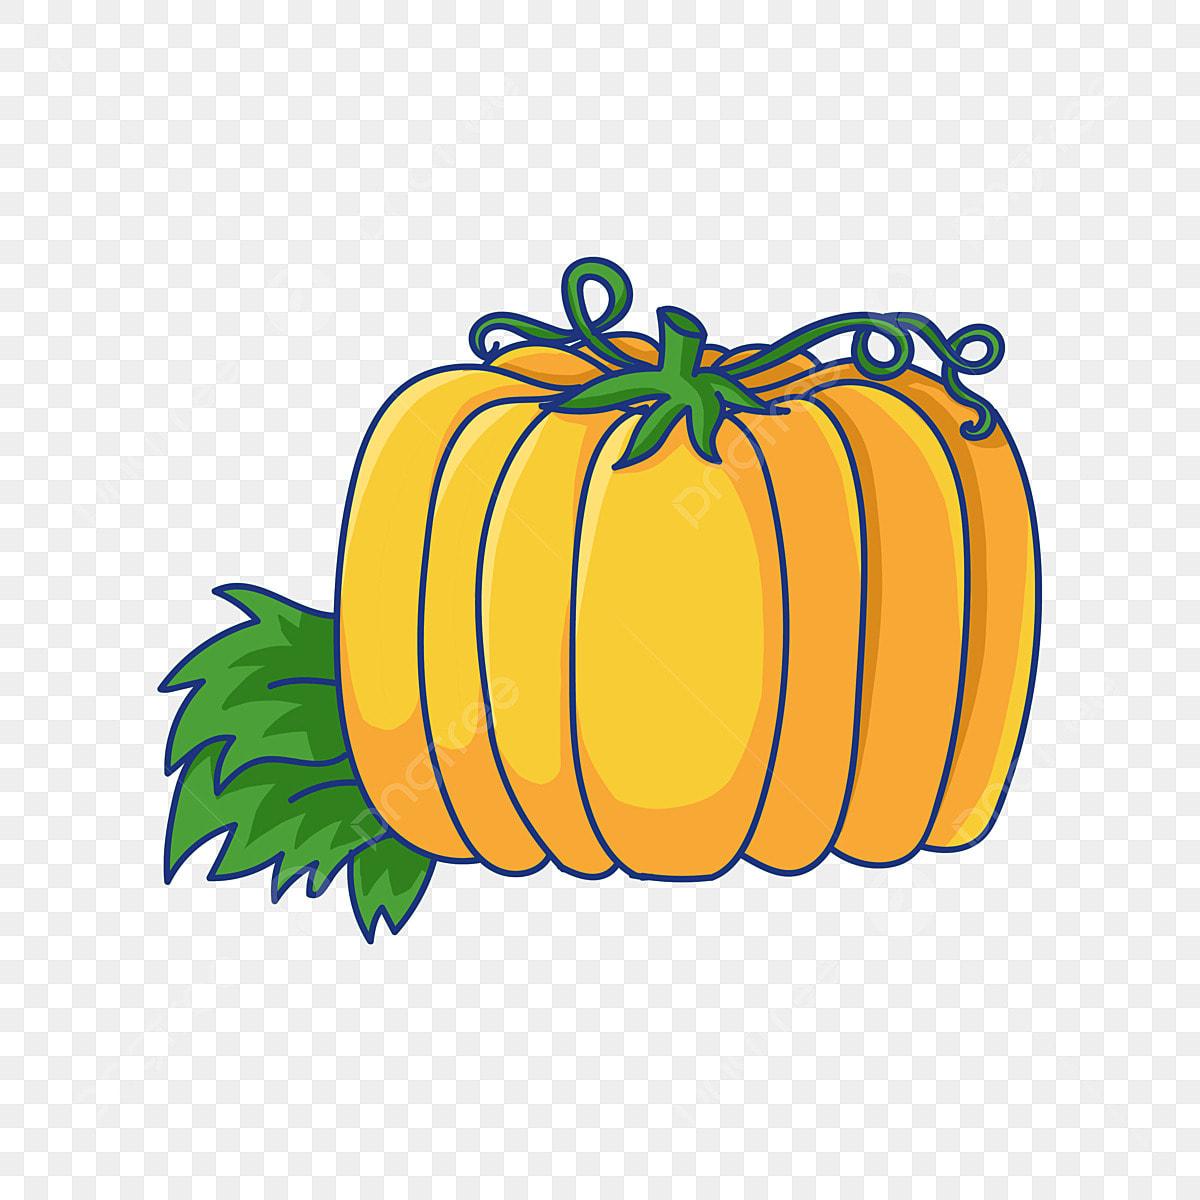 Autumn Pumpkin PNG Clipart | Fall clip art, Pumpkin pictures, Pumpkin images